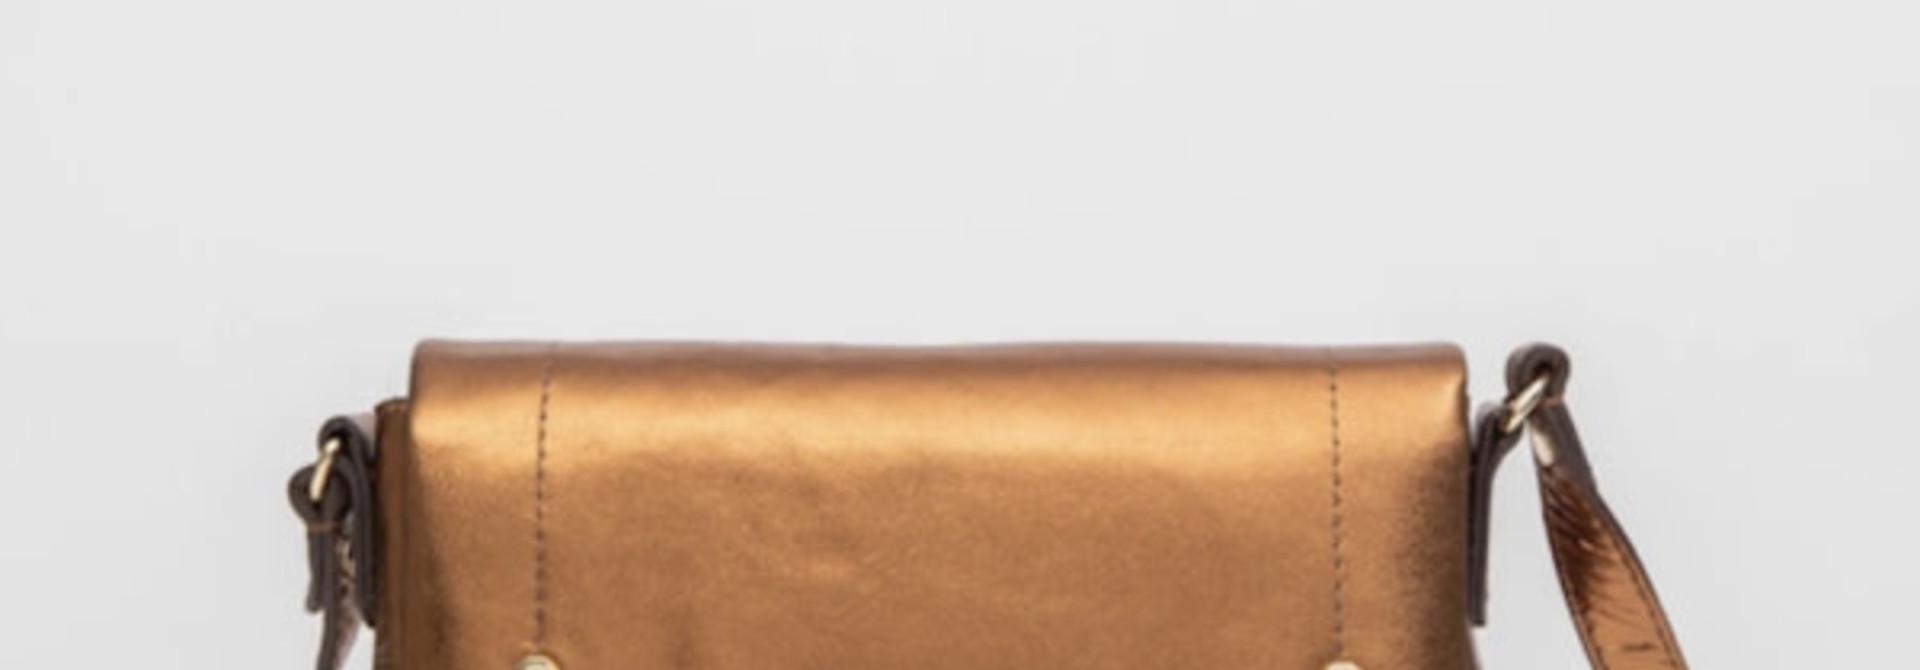 Dyonisos bronze Clio goldbrenner